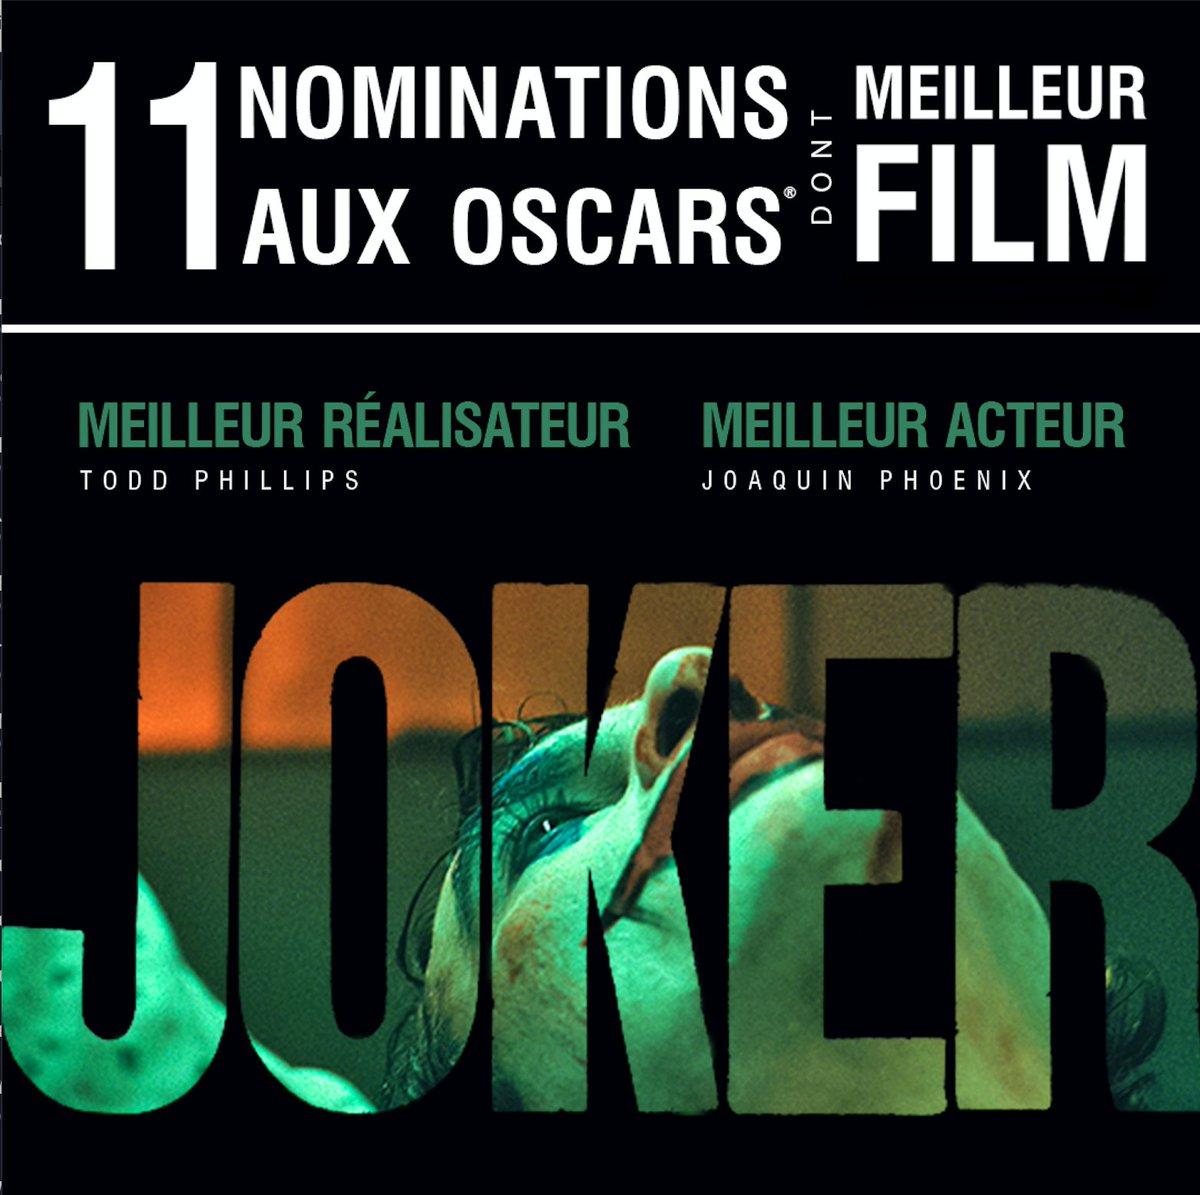 ✅ Golden Globe, ✅ BAFTA, ✅ SAG Award, ⬜️ Oscar... Joaquin Phoenix fera-t-il un sans faute ➡️ bit.ly/JokerOscars